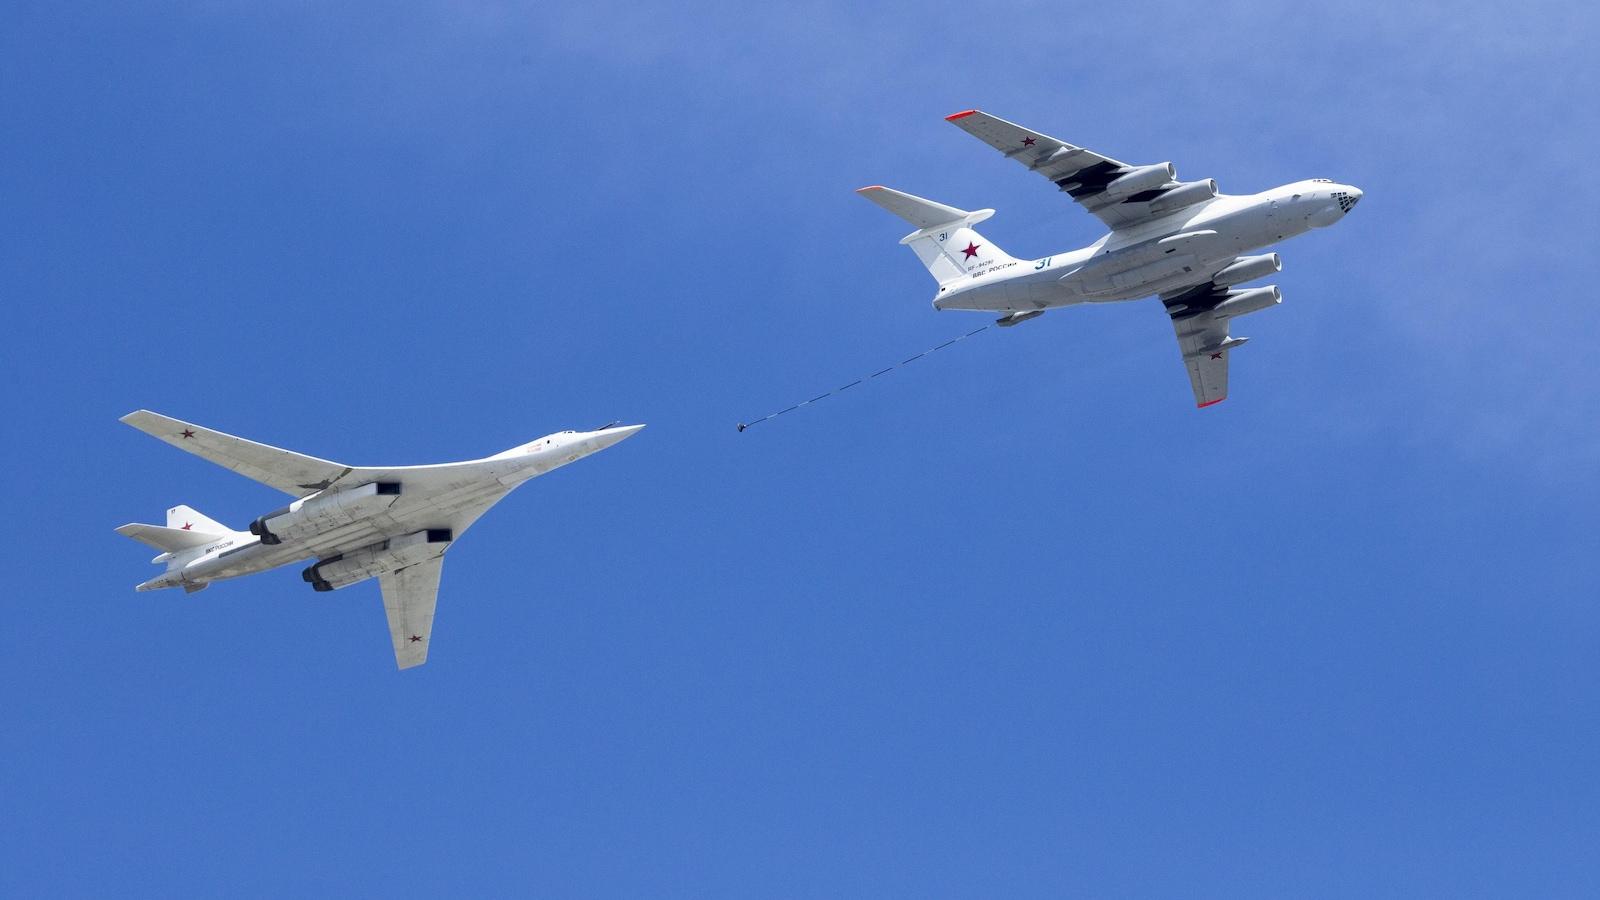 Deux avions de combat dans le ciel.